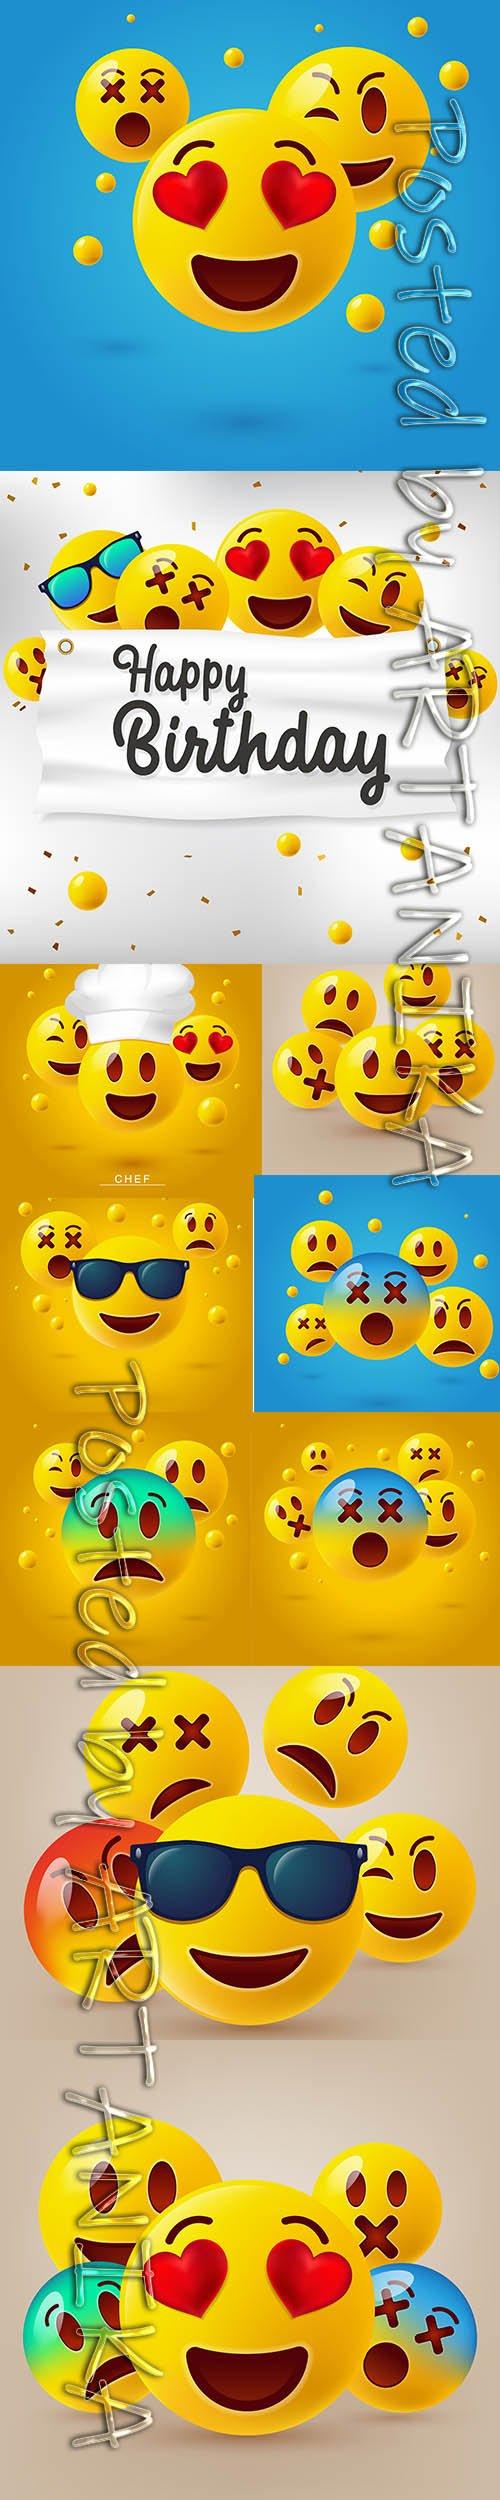 Cute Emoticons Illustration Set